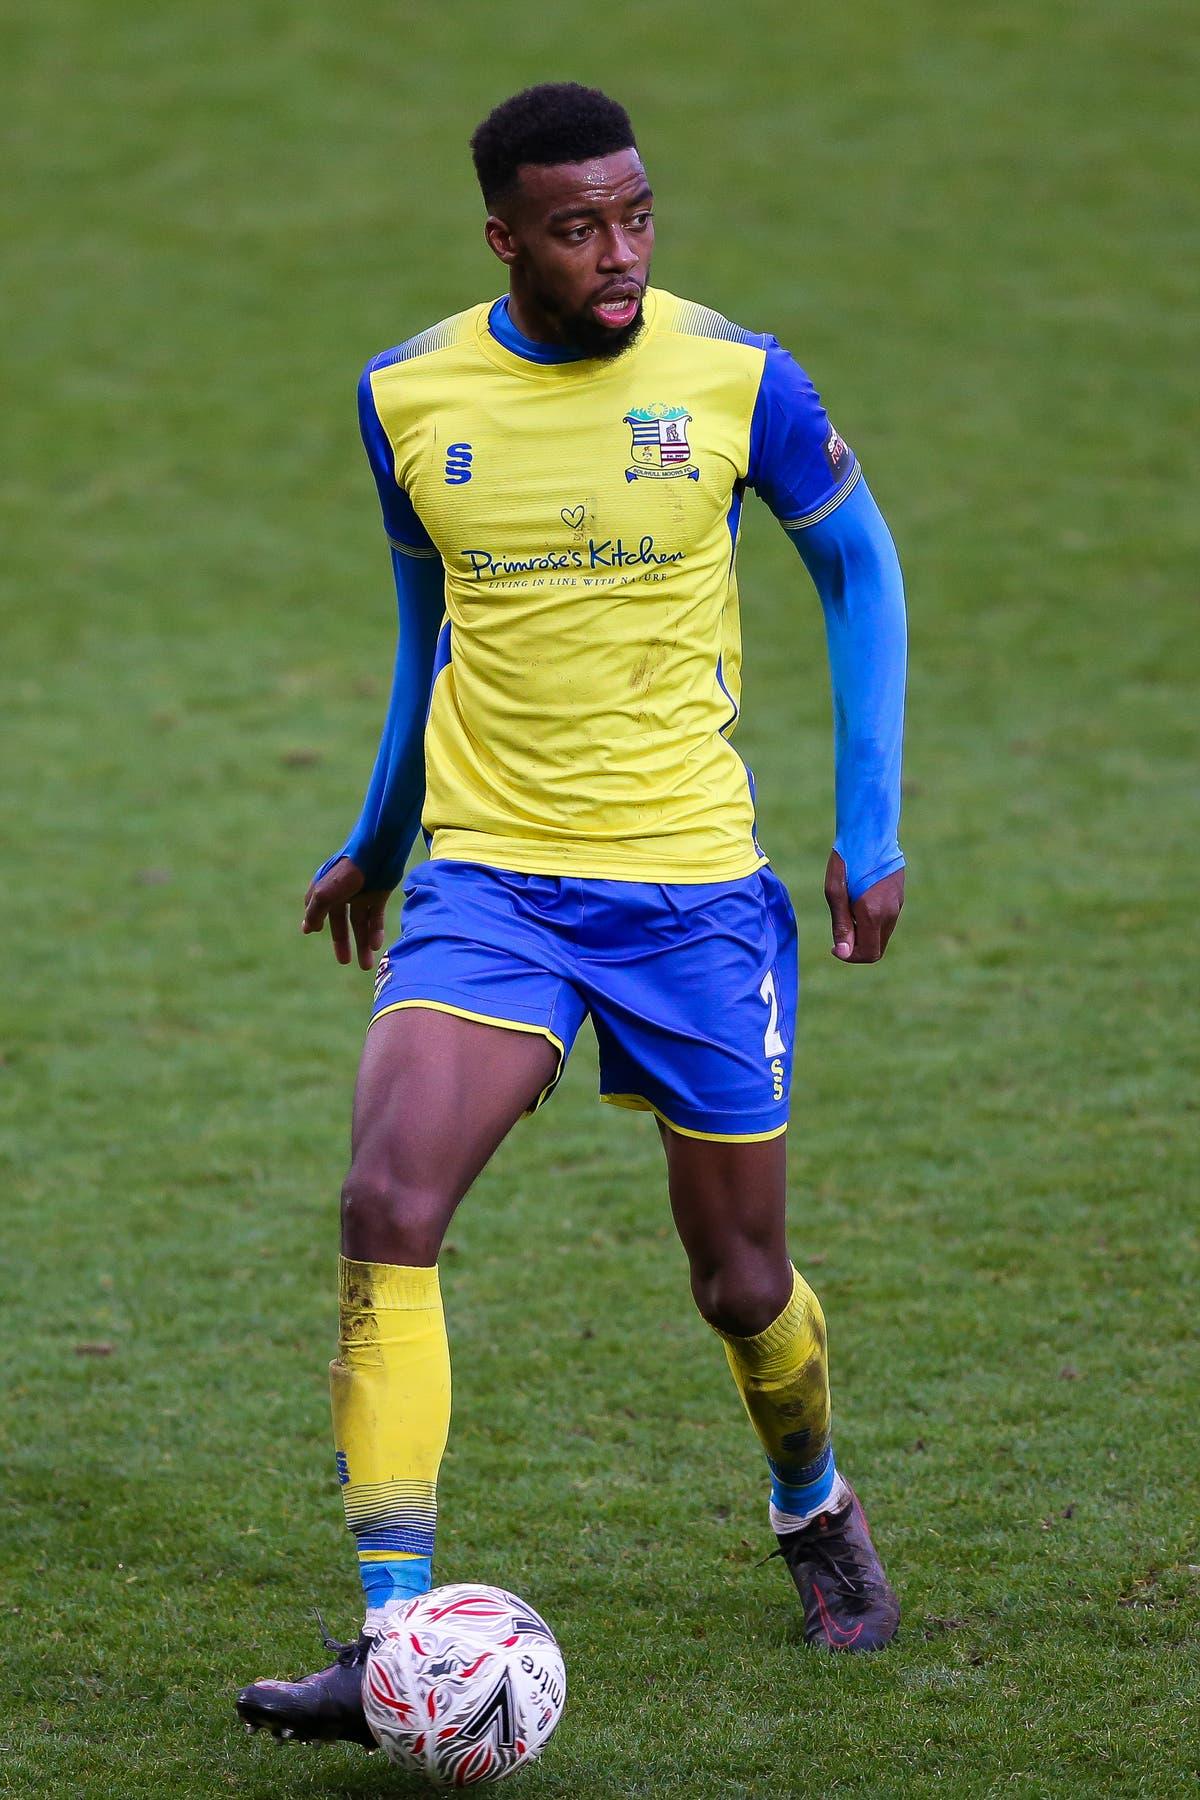 Solihull brush aside Wealdstone to claim fifth successive win